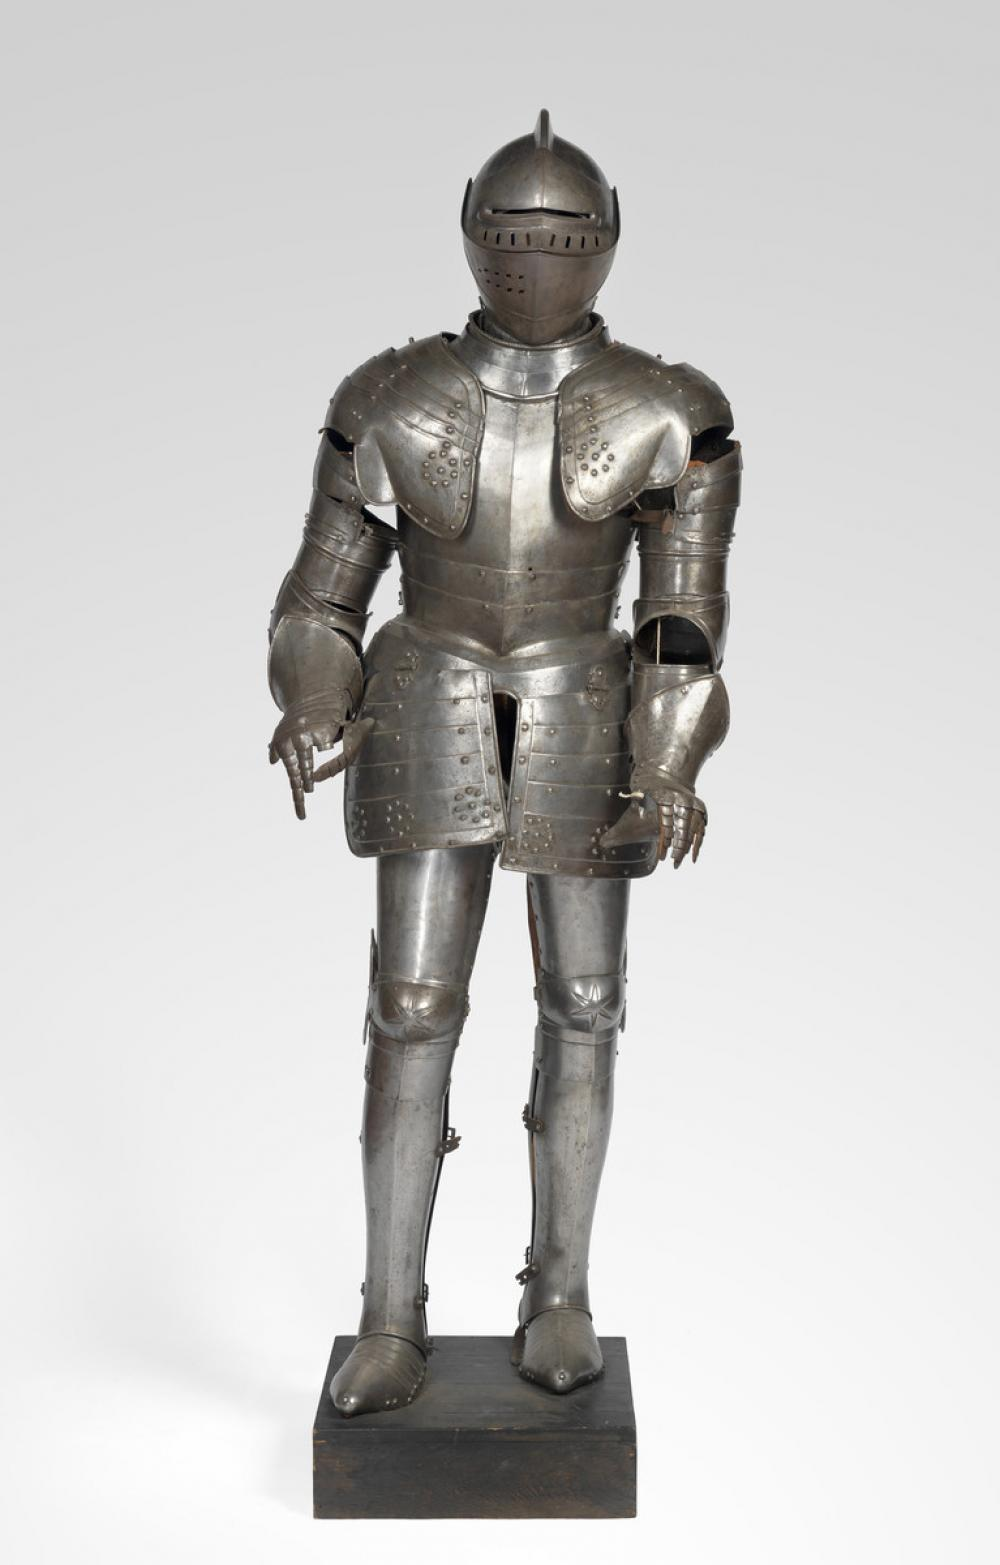 Italian; German; Austrian, Suit of armor